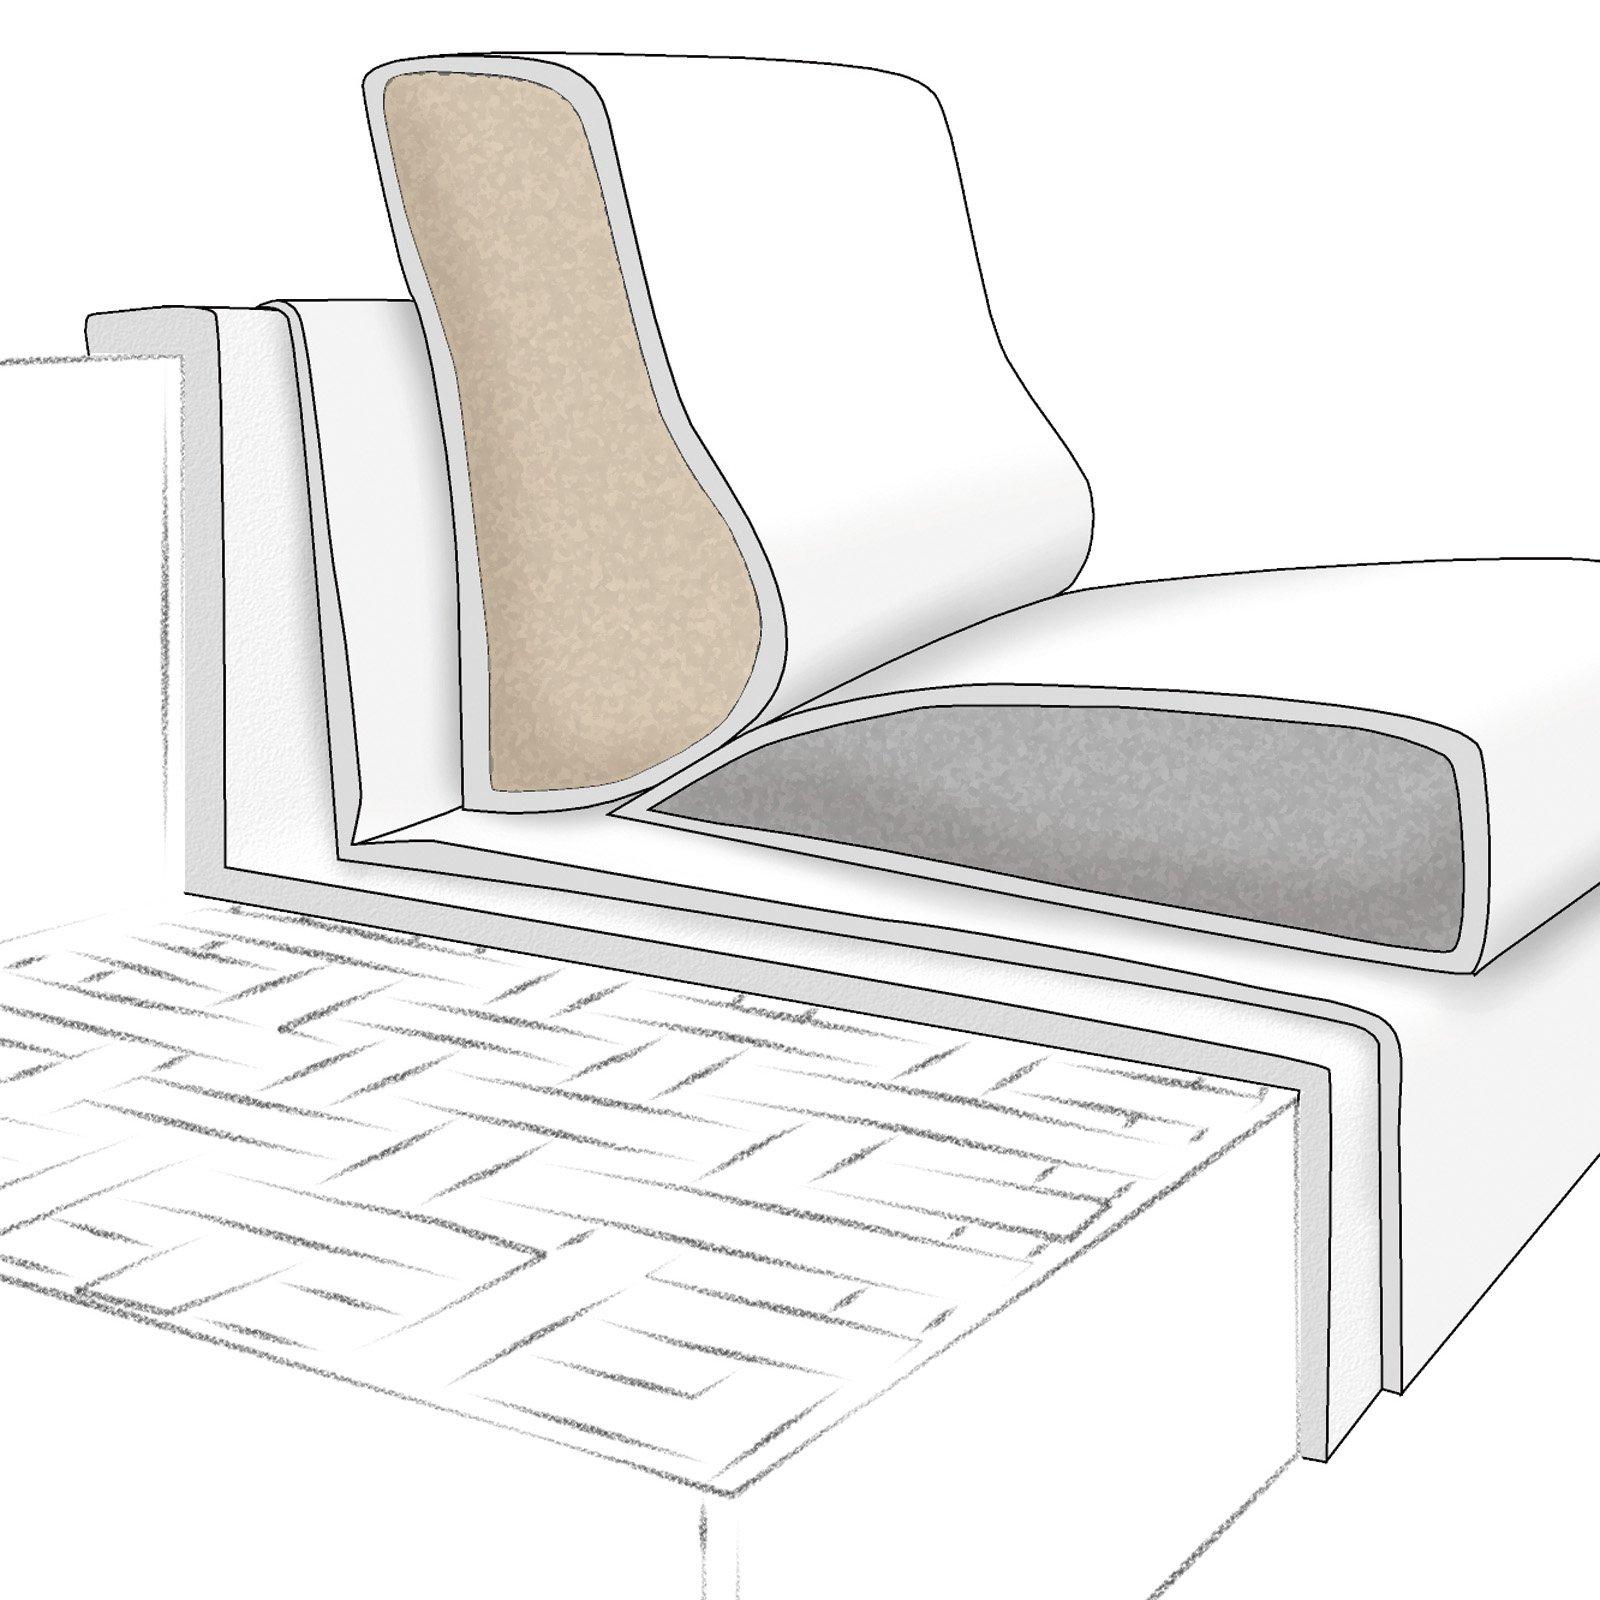 materiale per imbottitura divani sanotint light tabella